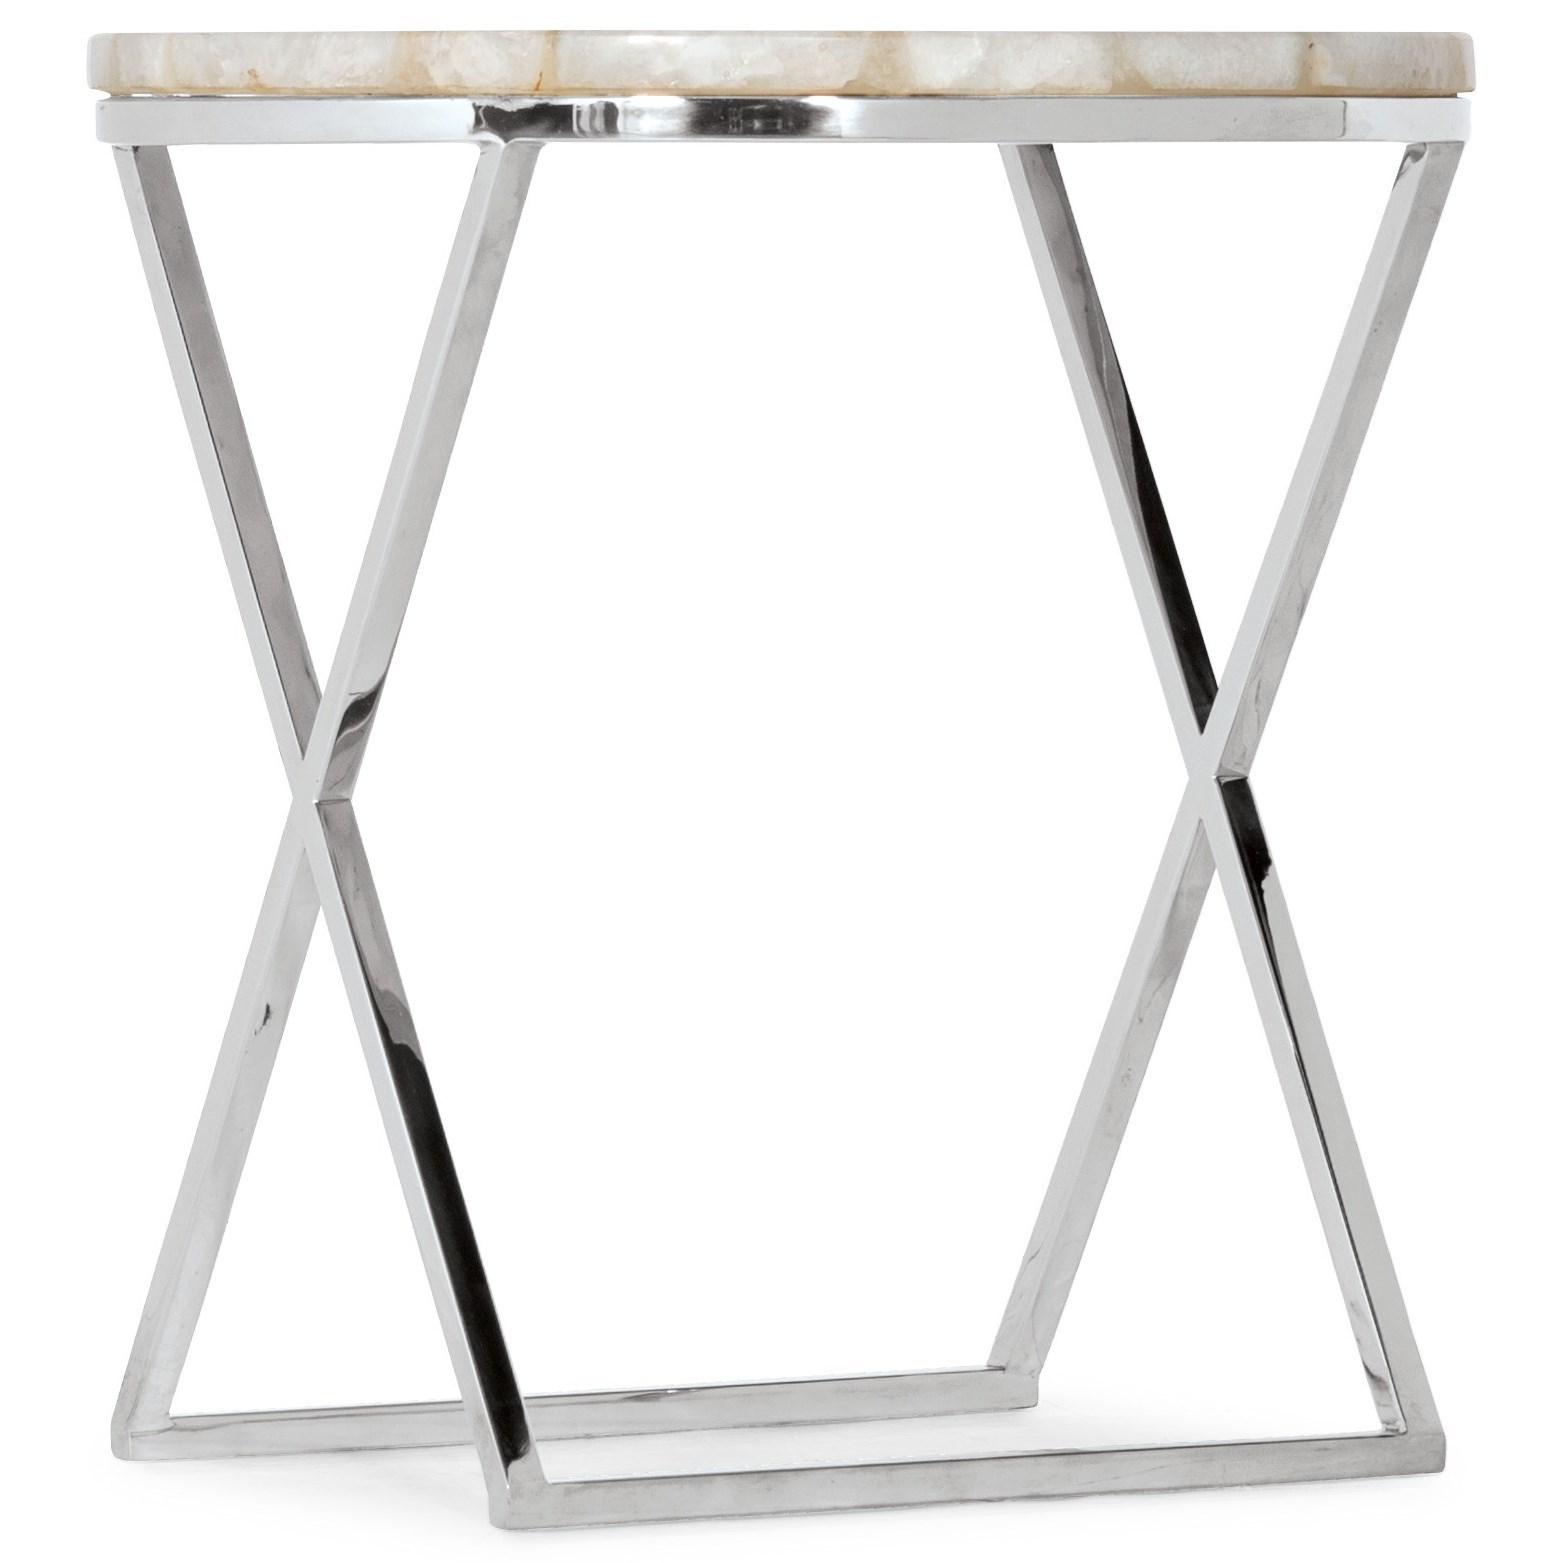 Melange Kaitlyn Accent Table by Hooker Furniture at Baer's Furniture